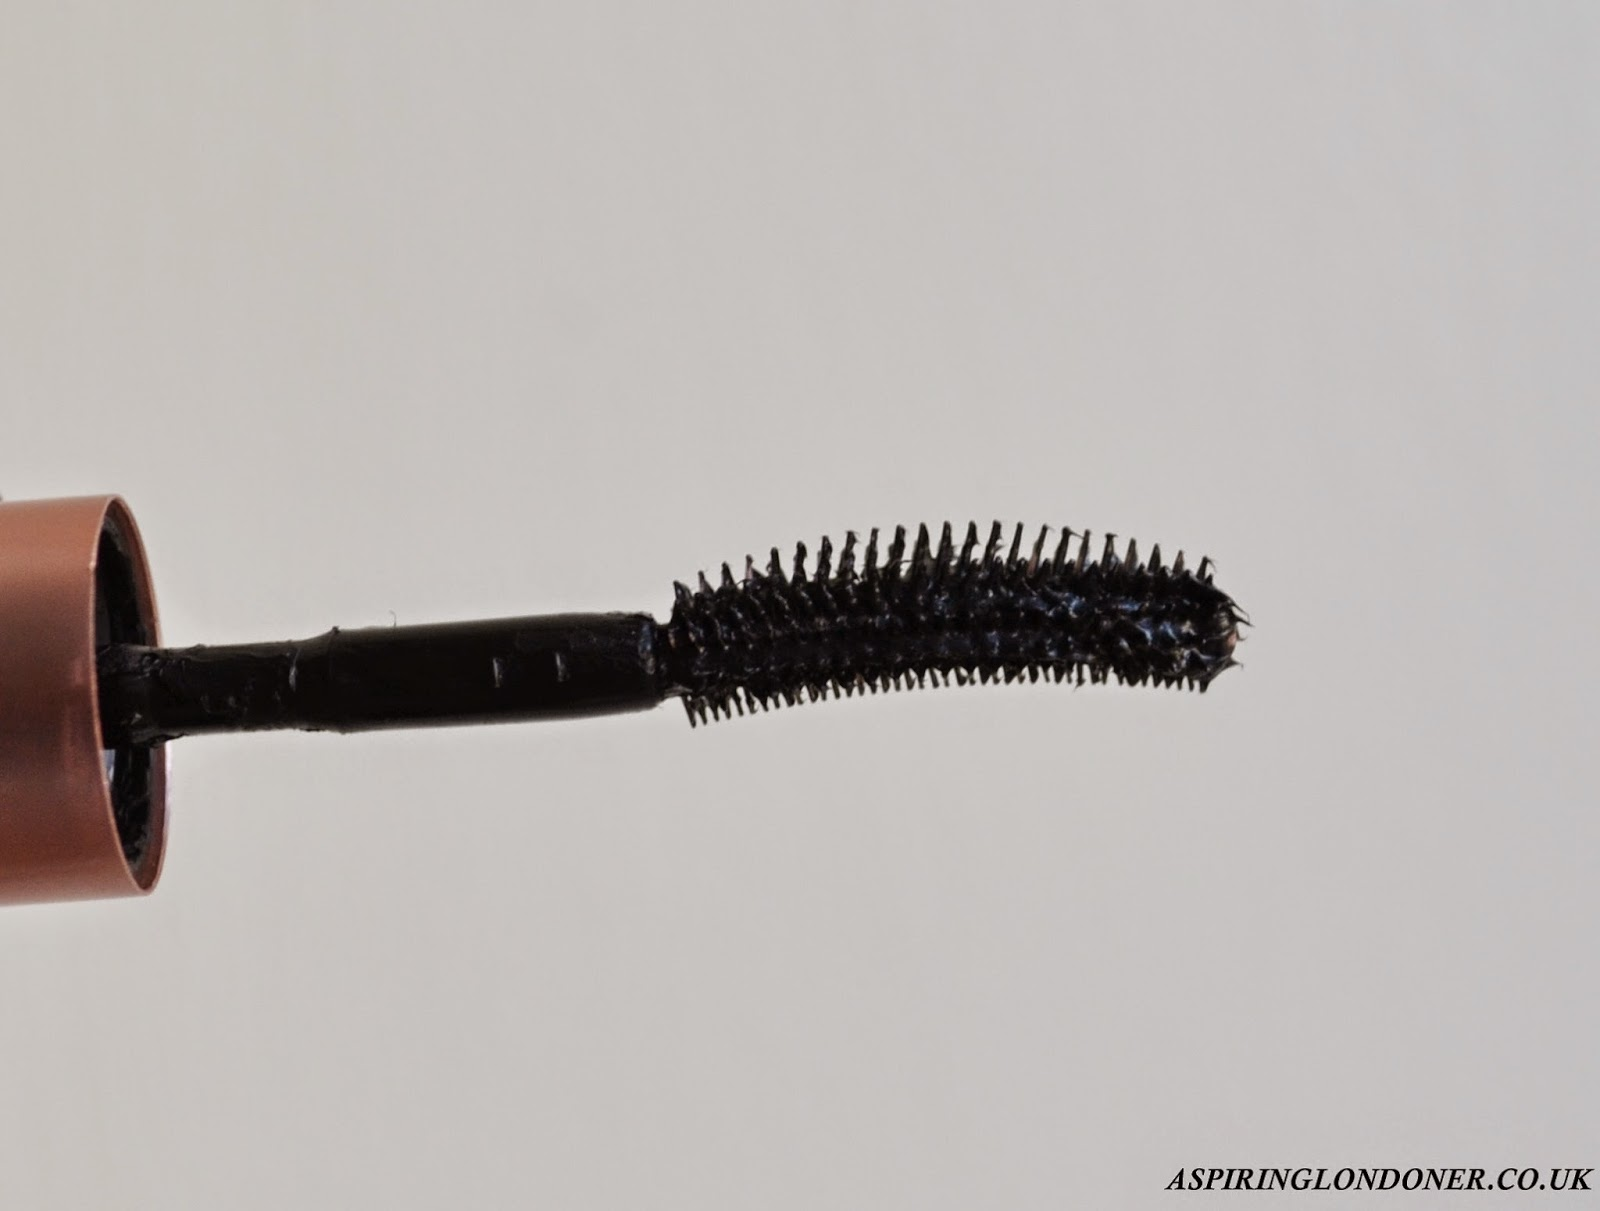 Benefit Cosmetics Roller Lash Mascara Wand Review - Aspiring Londoner